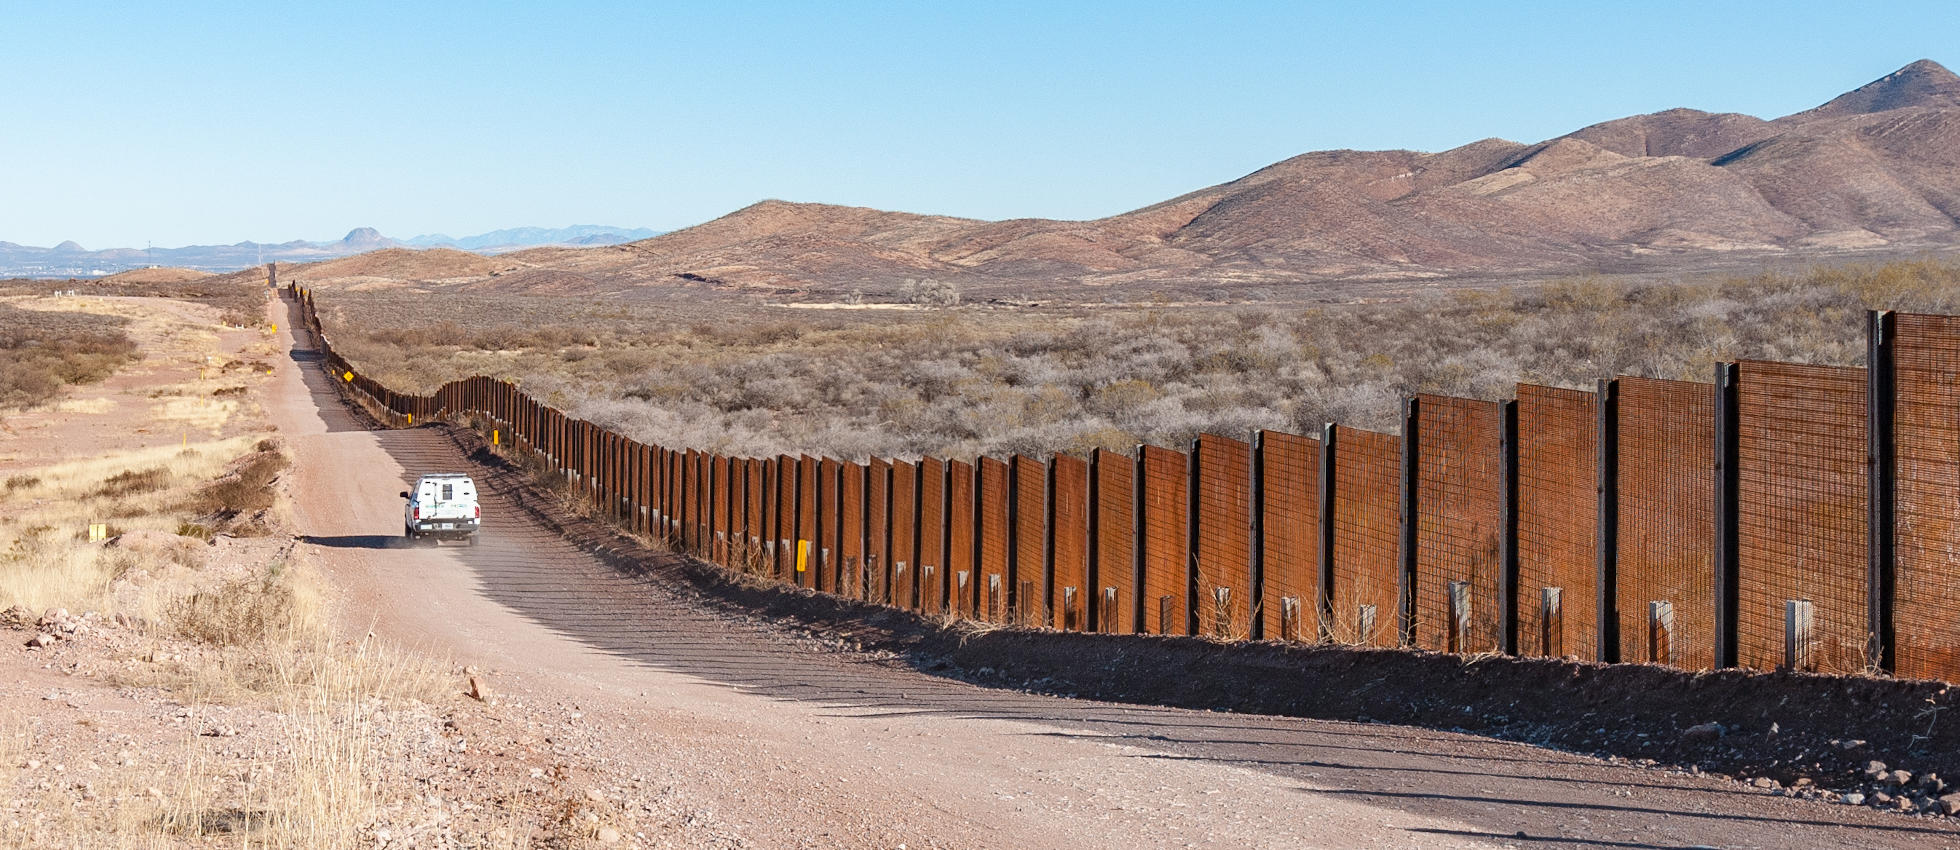 ARCC Gap | Southwest: Utah, Colorado, New Mexico, Arizona & California